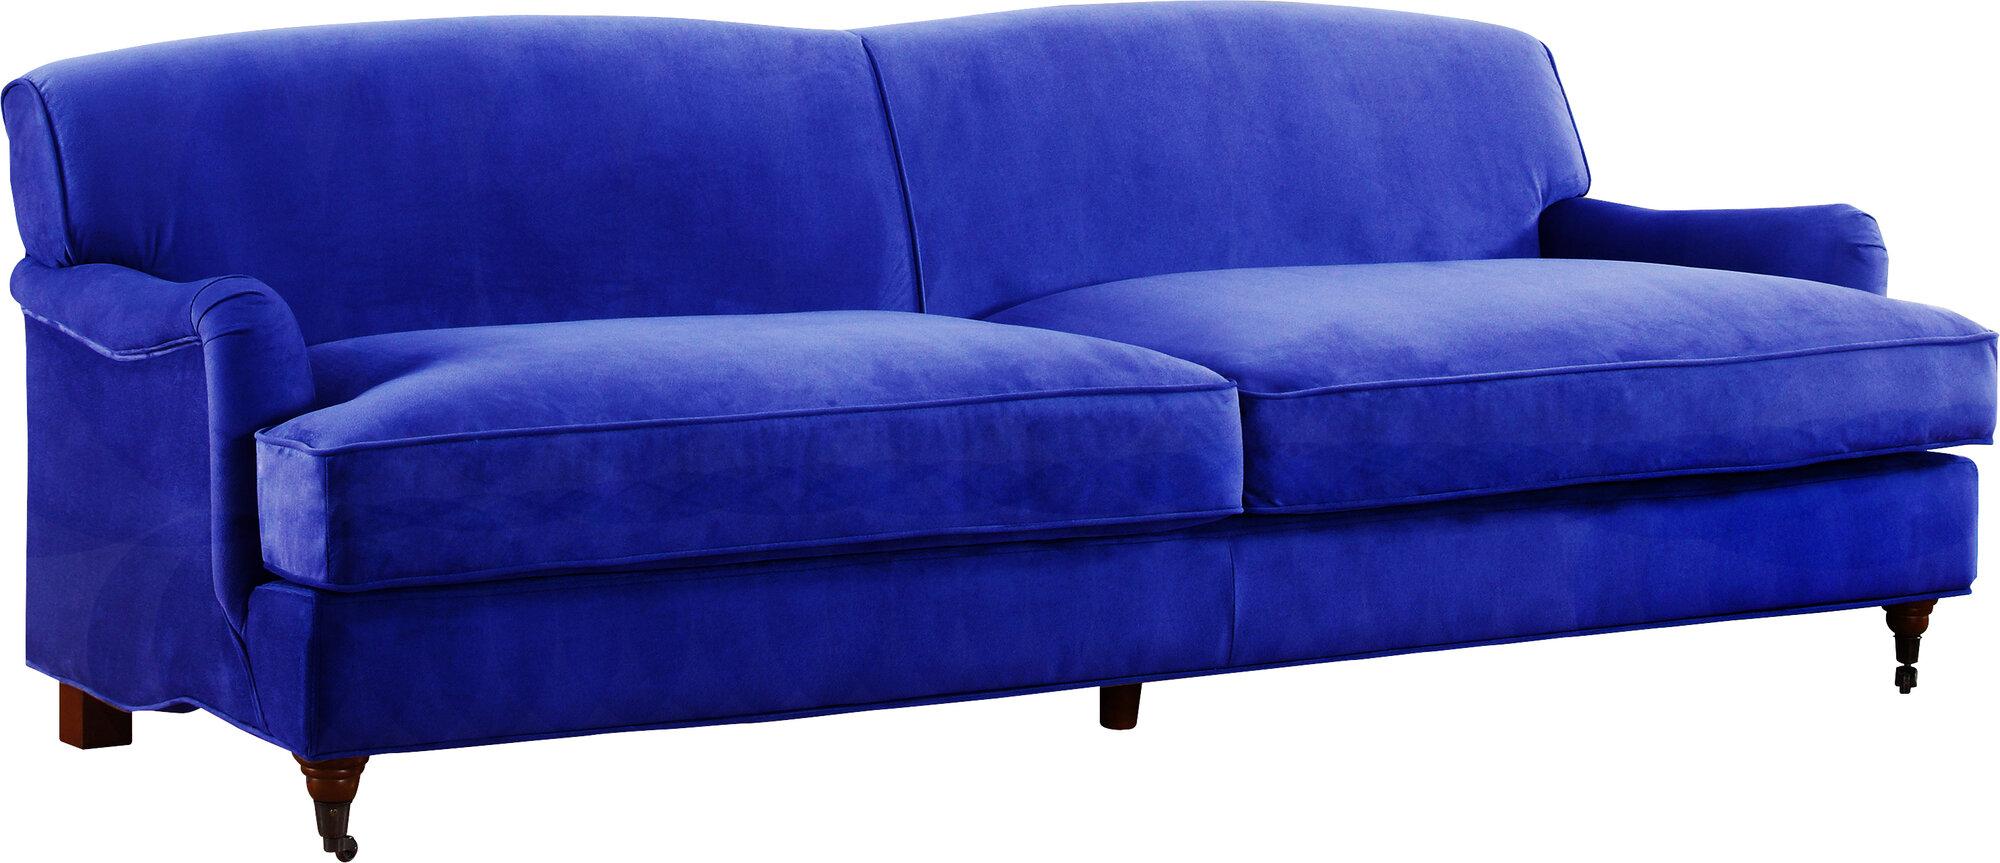 madison home usa mid century modern large sofa ebay. Black Bedroom Furniture Sets. Home Design Ideas